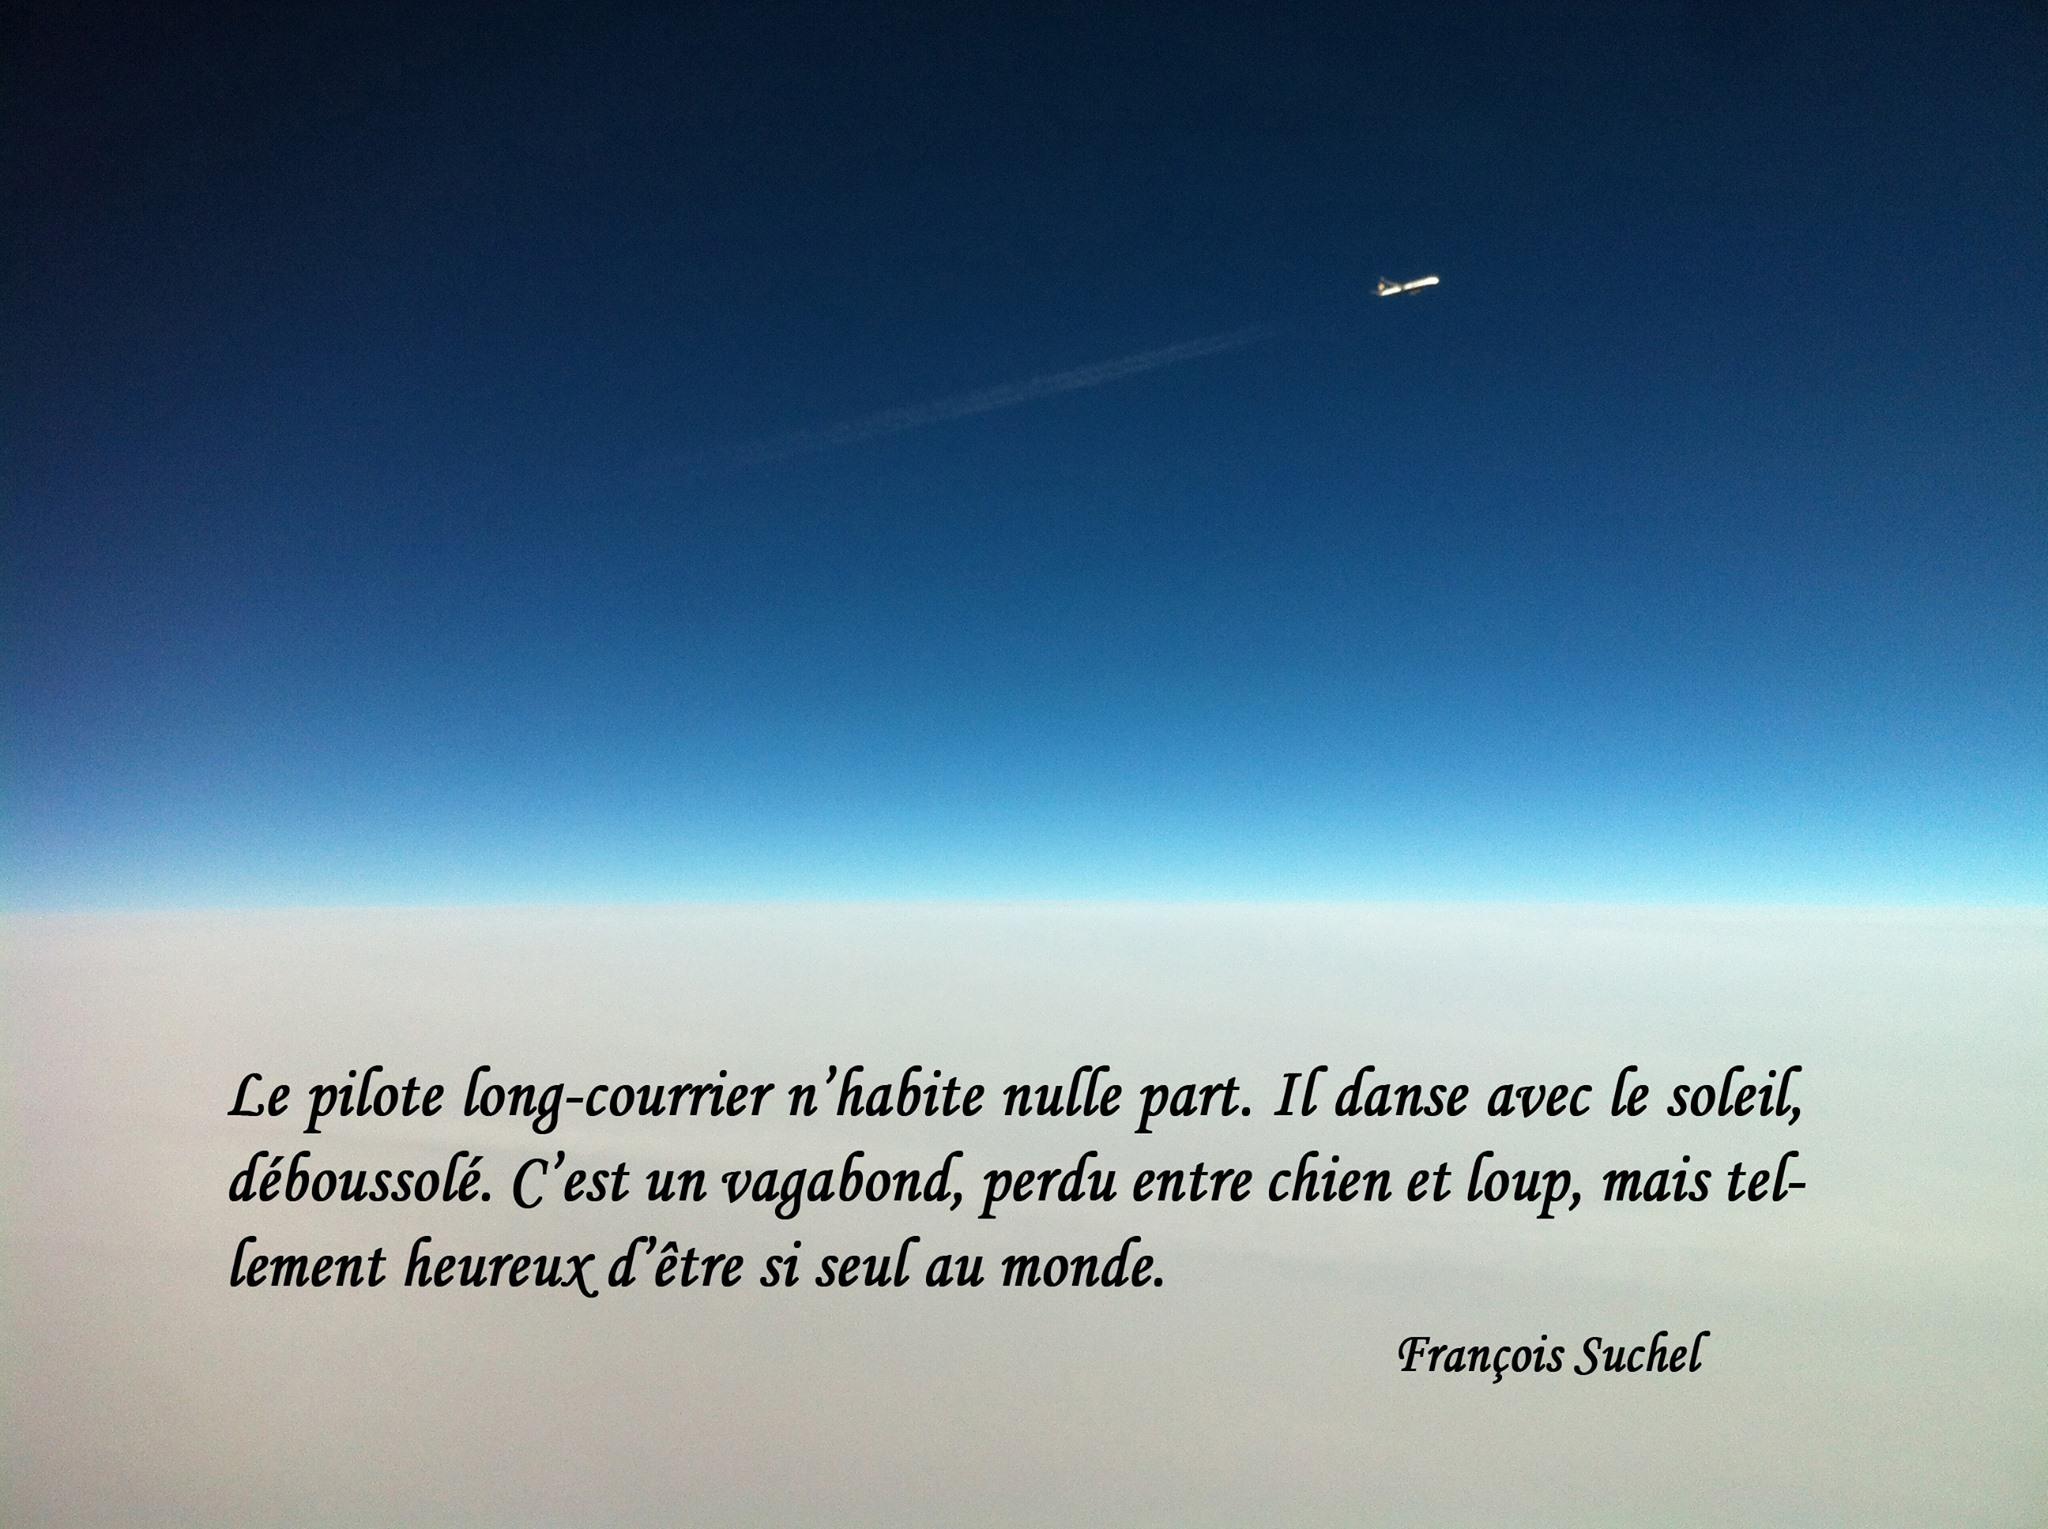 livres,aviation,aventures,anecdotes,françois suchel,paulsen